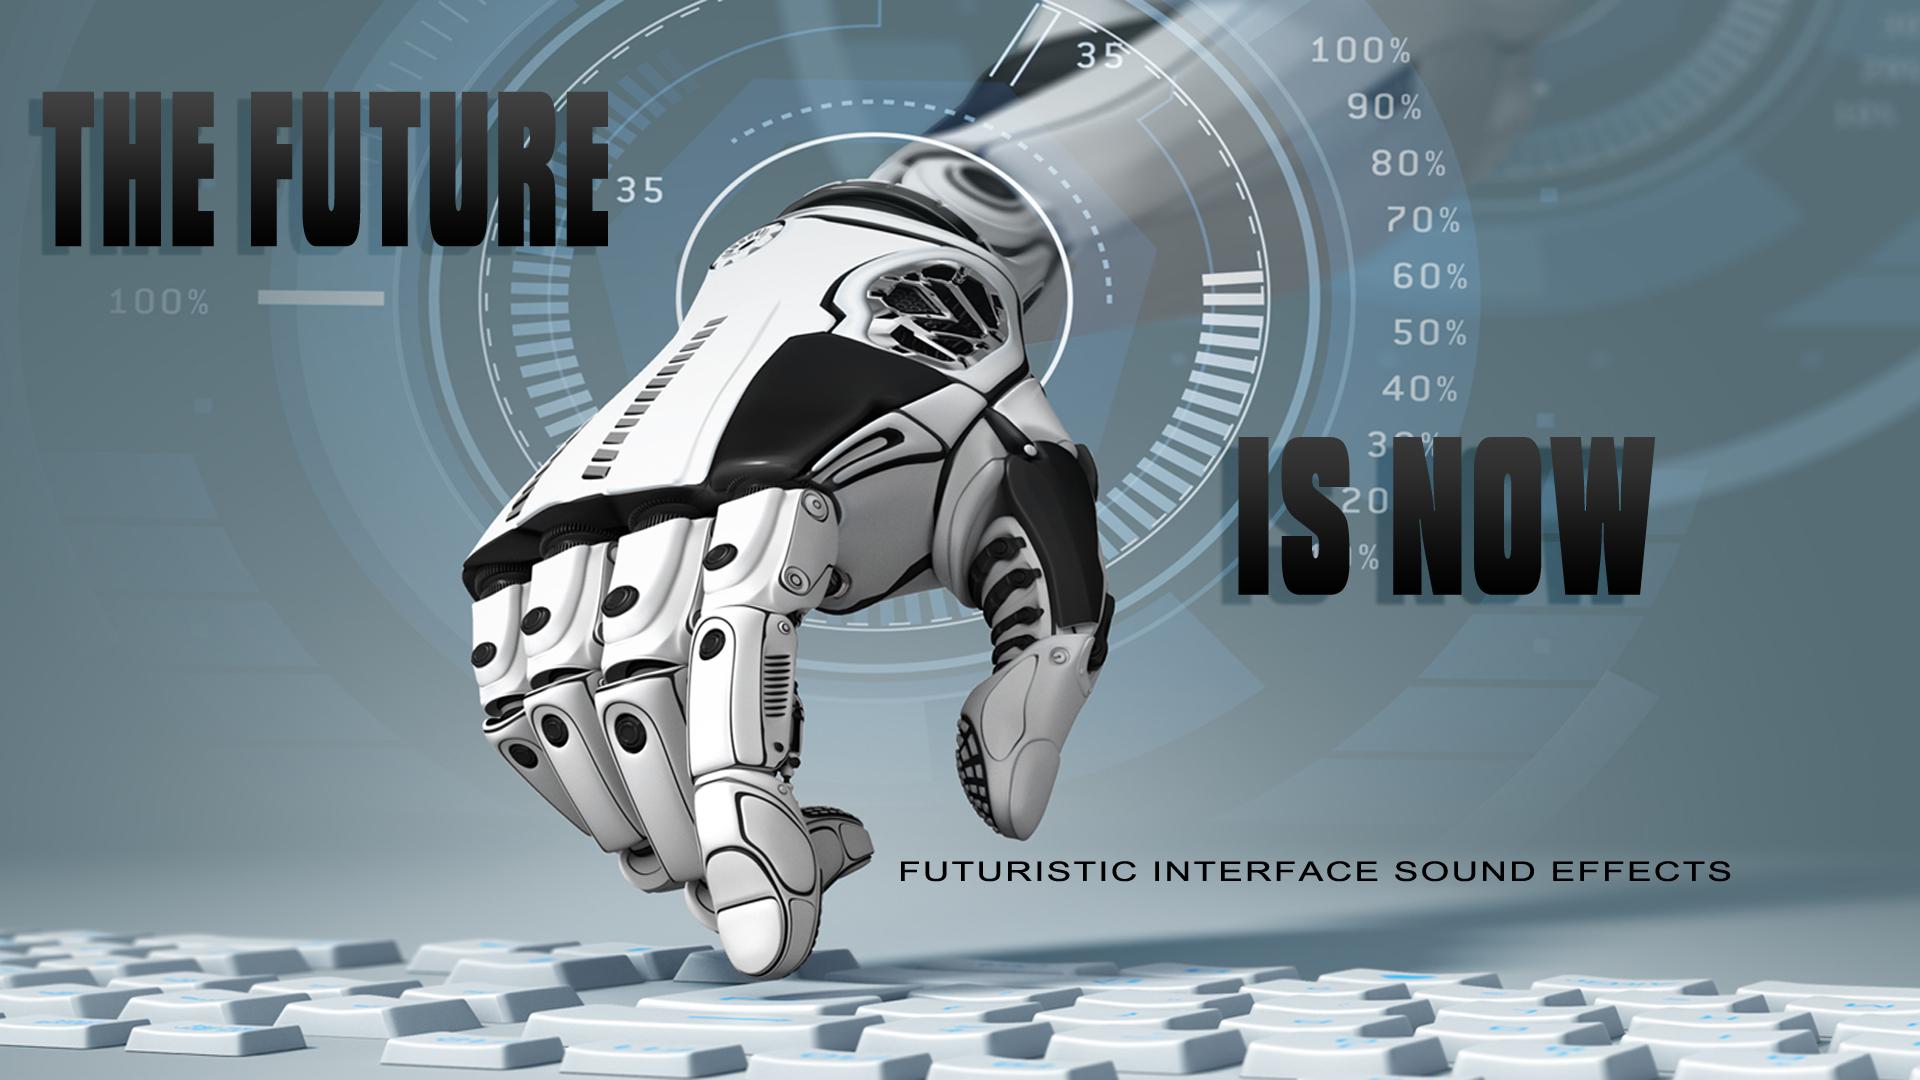 Interface Sounds, Sci-Fi Futuristic Computer Beeps & Buttons